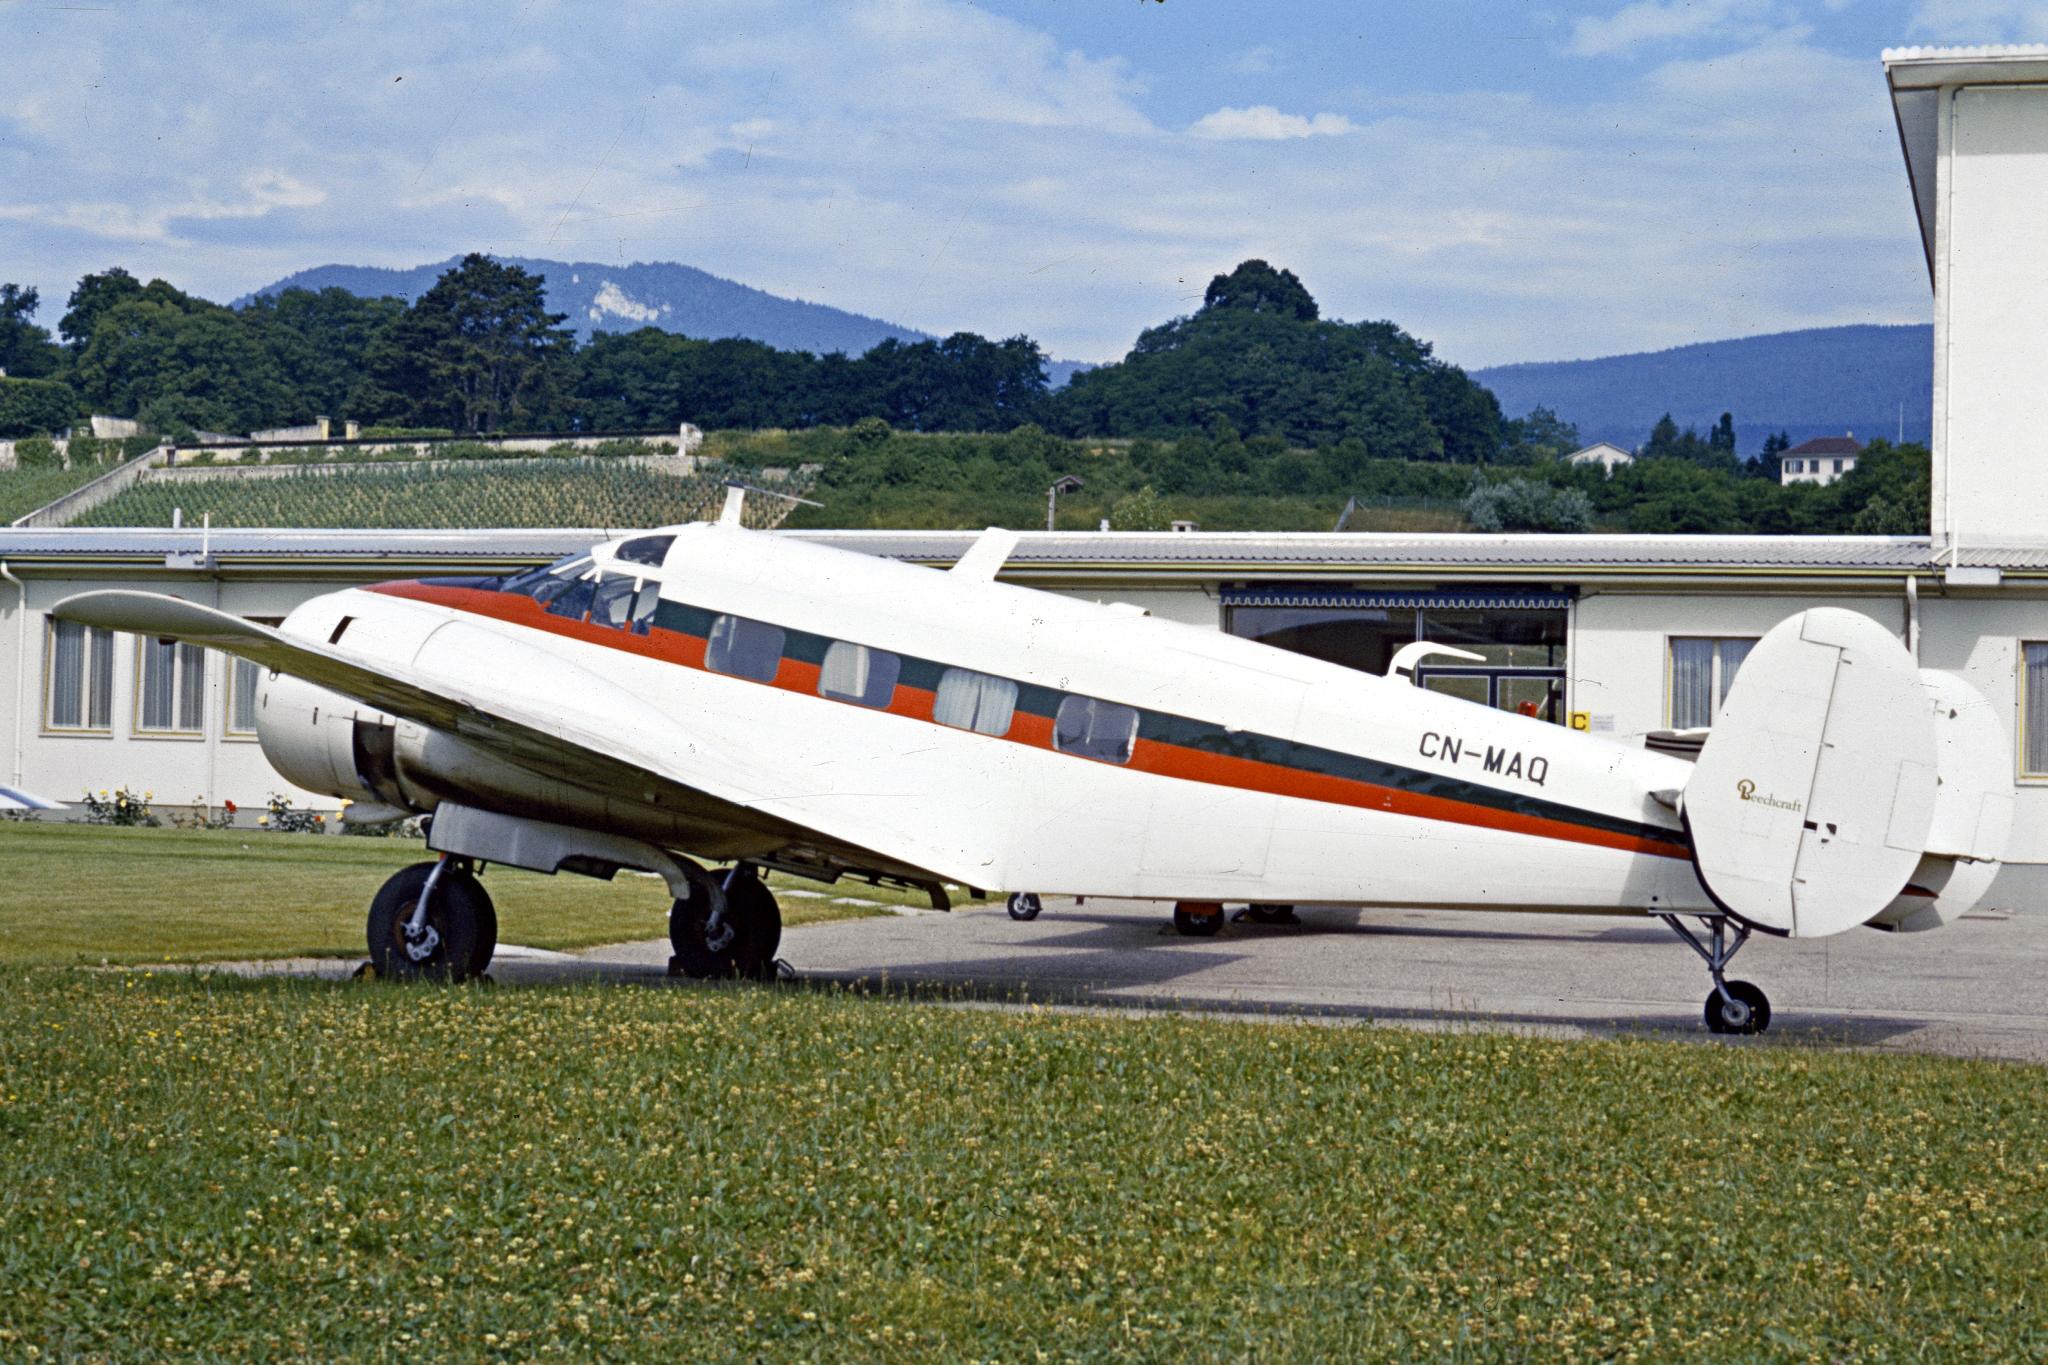 FRA: Photos anciens avions des FRA - Page 7 16011011002446242